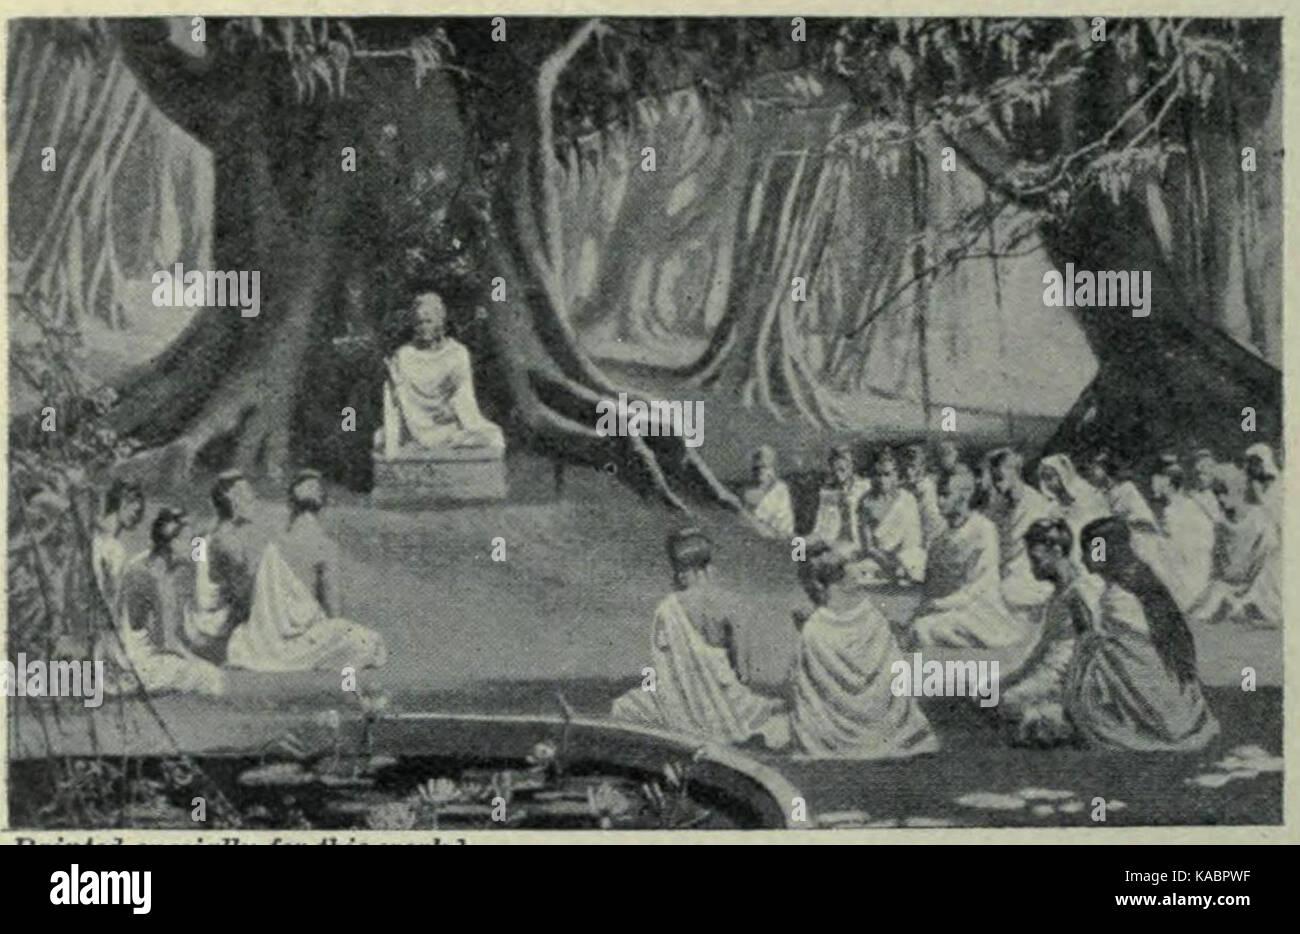 The last days of buddha teachings - Stock Image